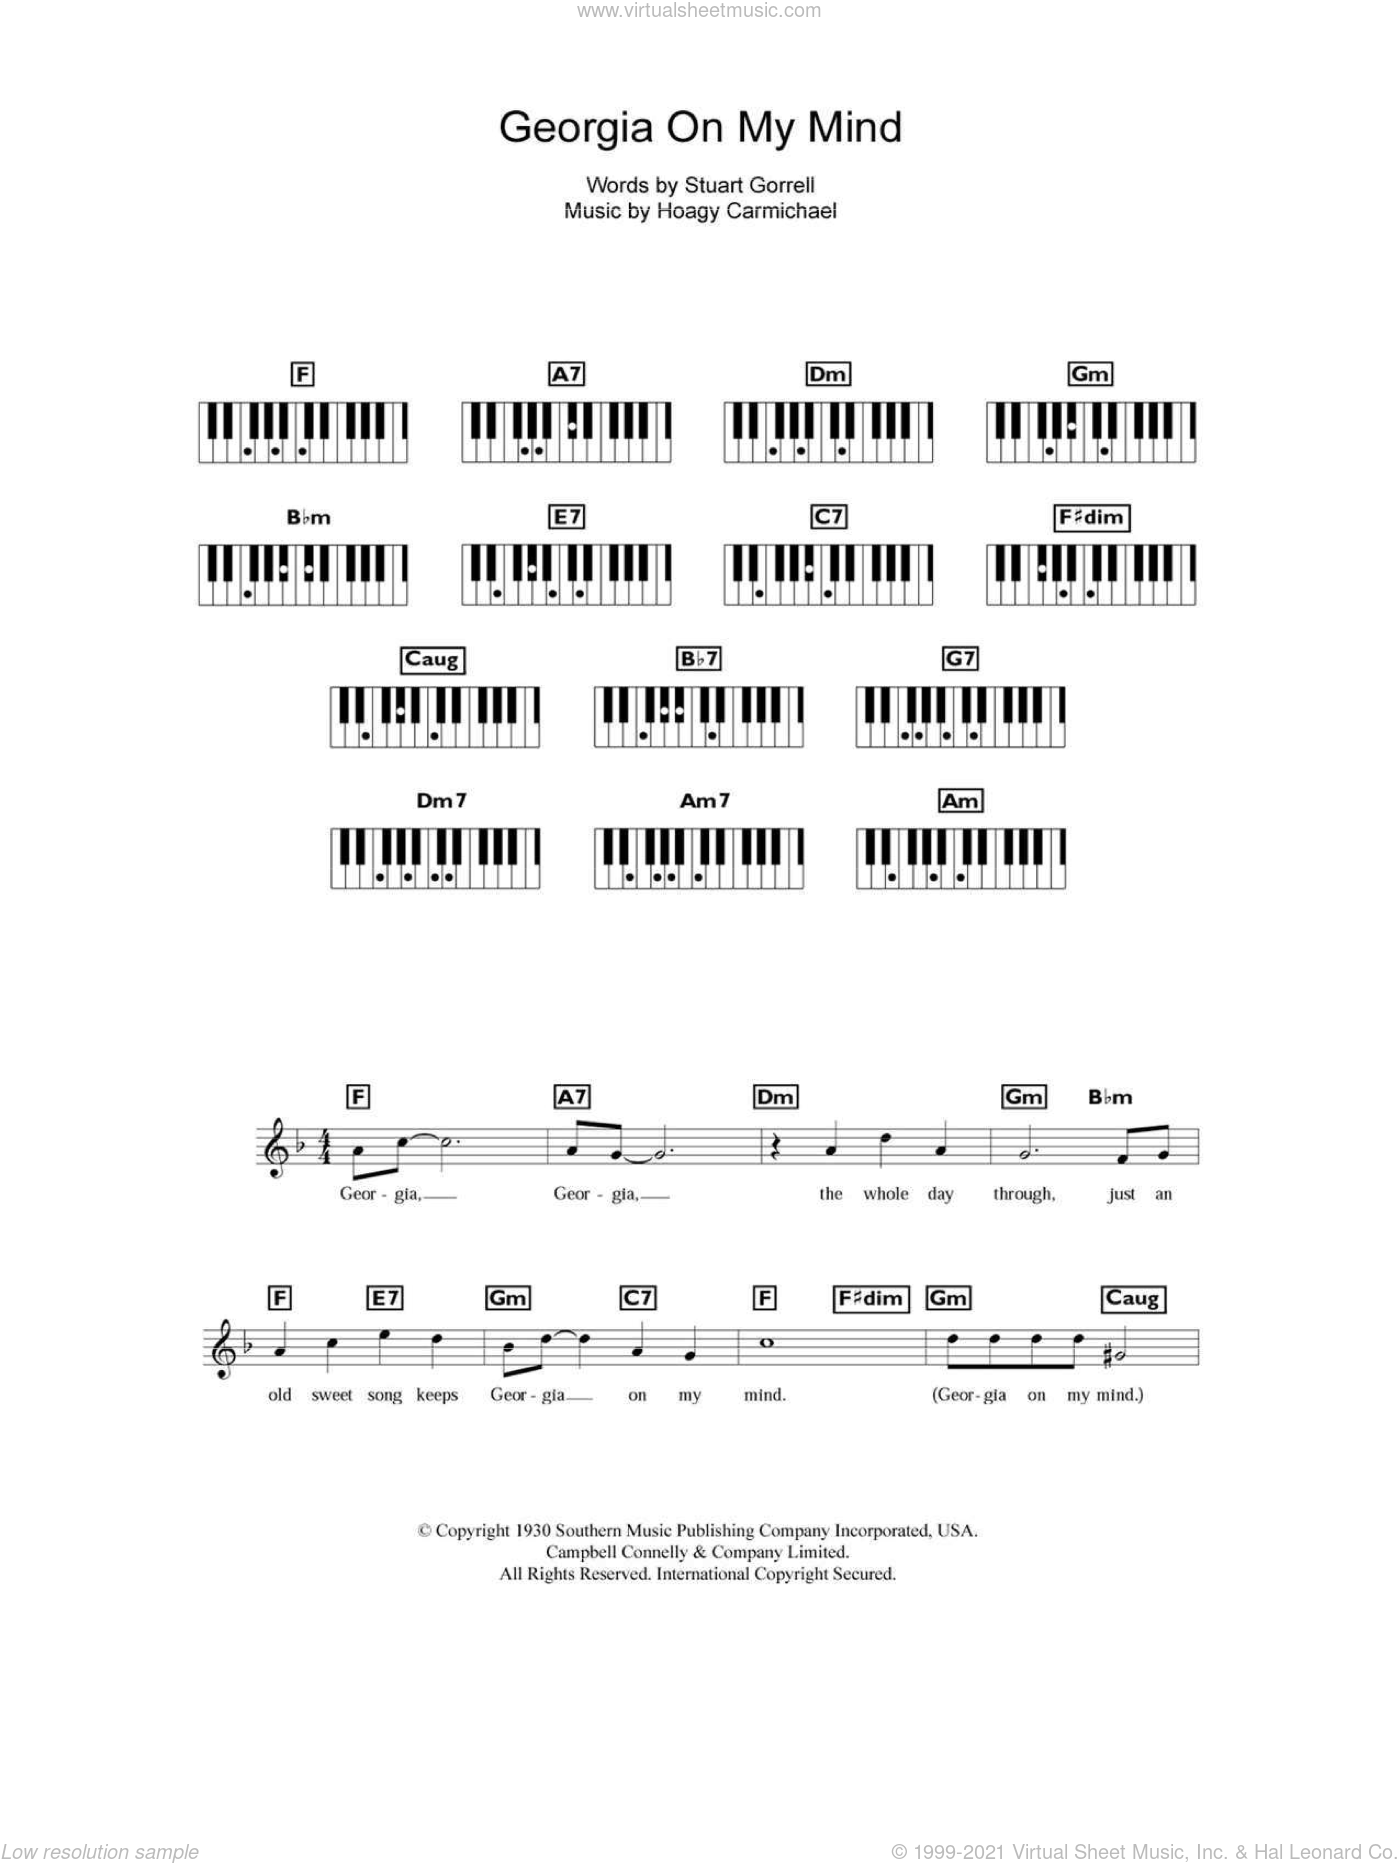 Georgia On My Mind sheet music for piano solo (chords, lyrics, melody) by Ray Charles, Hoagy Carmichael and Stuart Gorrell, intermediate piano (chords, lyrics, melody)